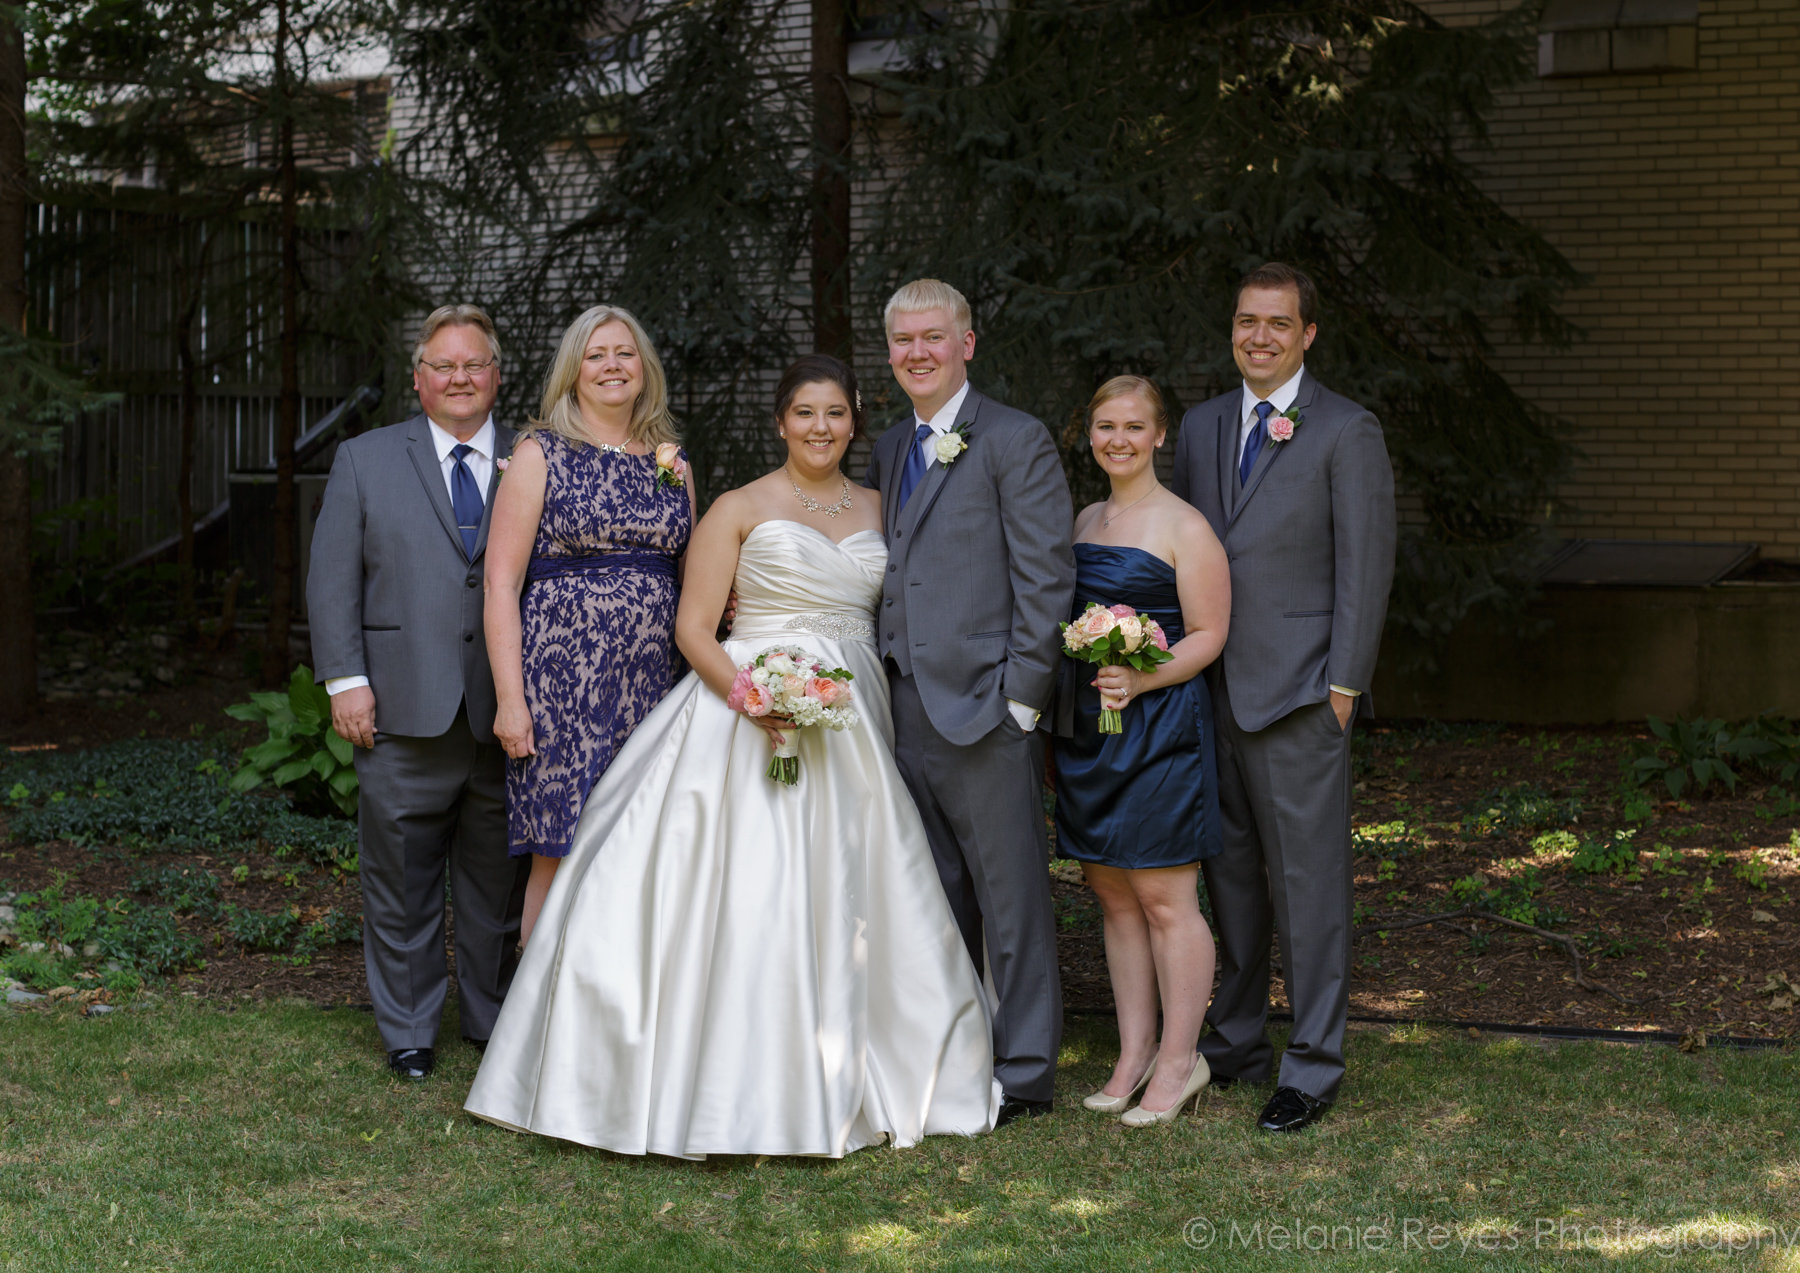 MC_annarbor_uofm_wedding_036